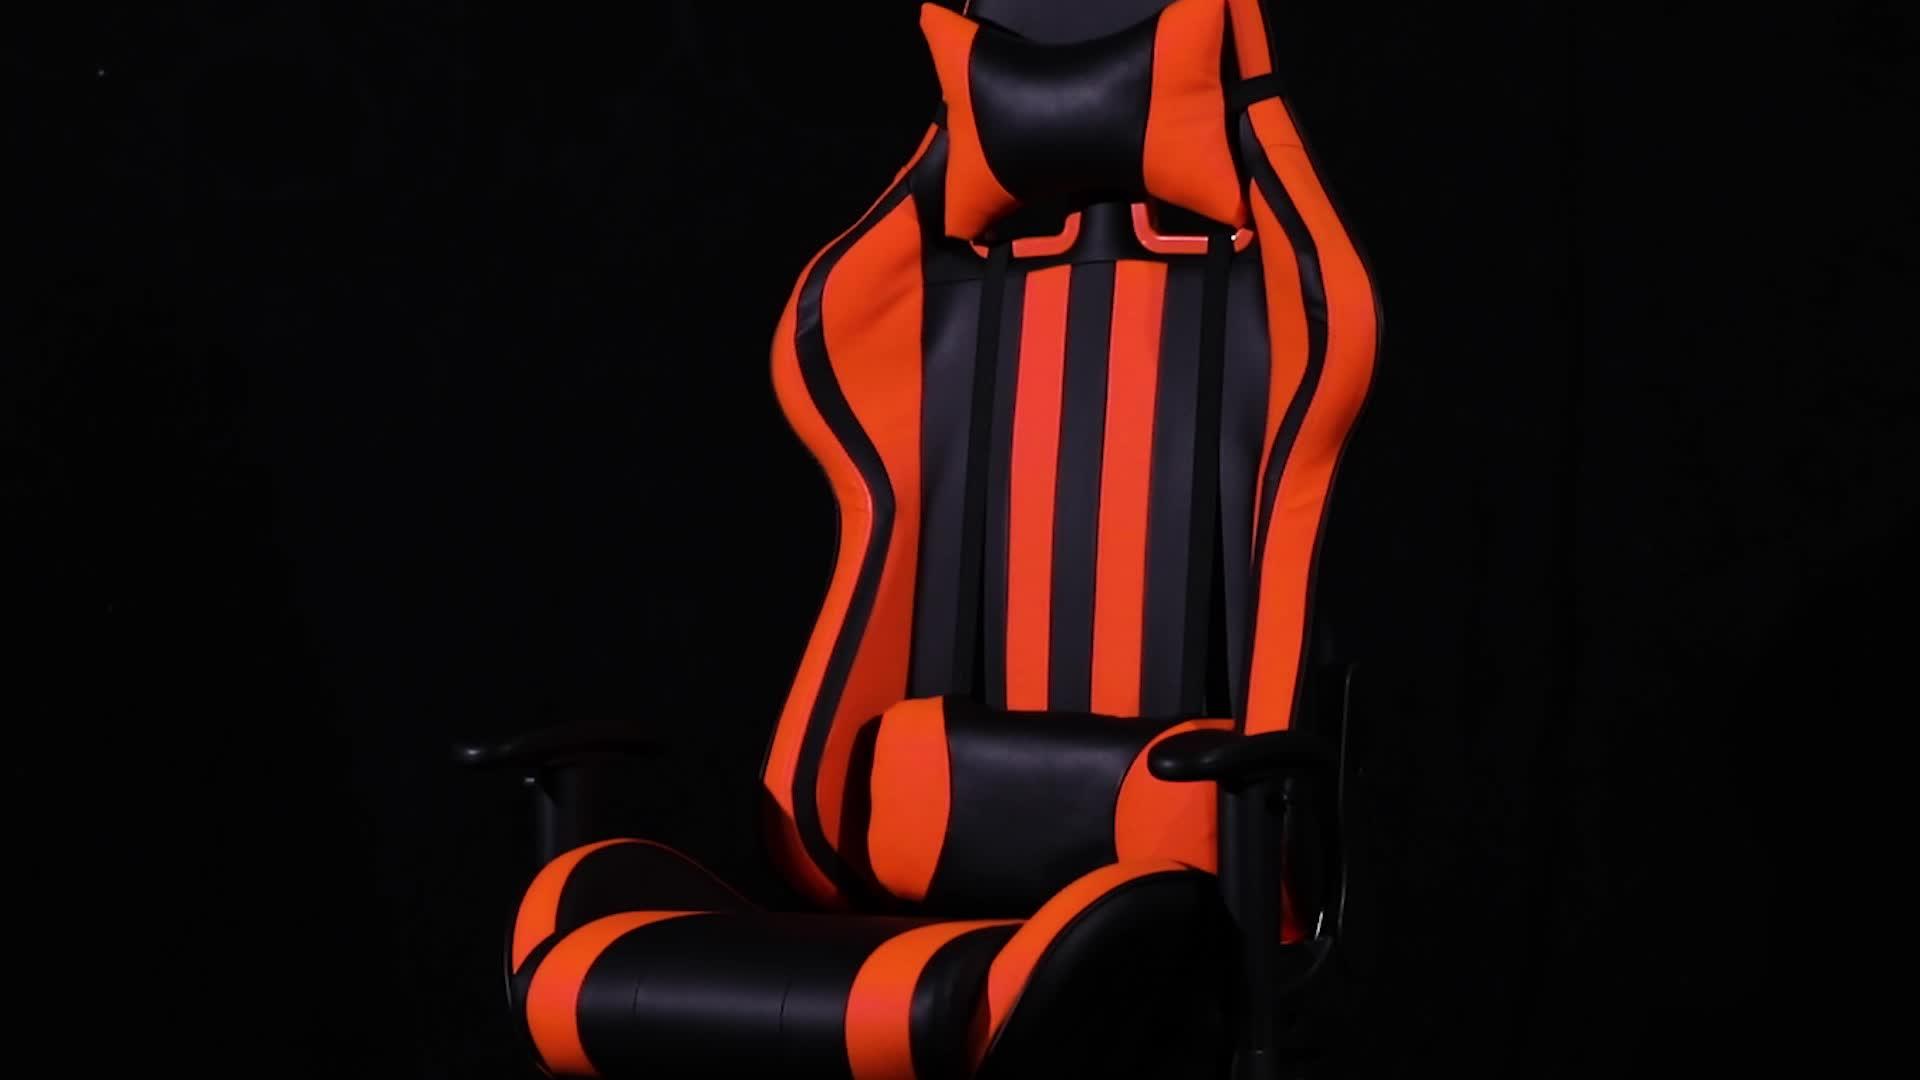 2019 नवीनतम डिजाइन फैक्टरी मूल्य सस्ते गेमिंग कुर्सी अनुकूलित पीसी कंप्यूटर खेल रेसिंग गेमिंग कुर्सी